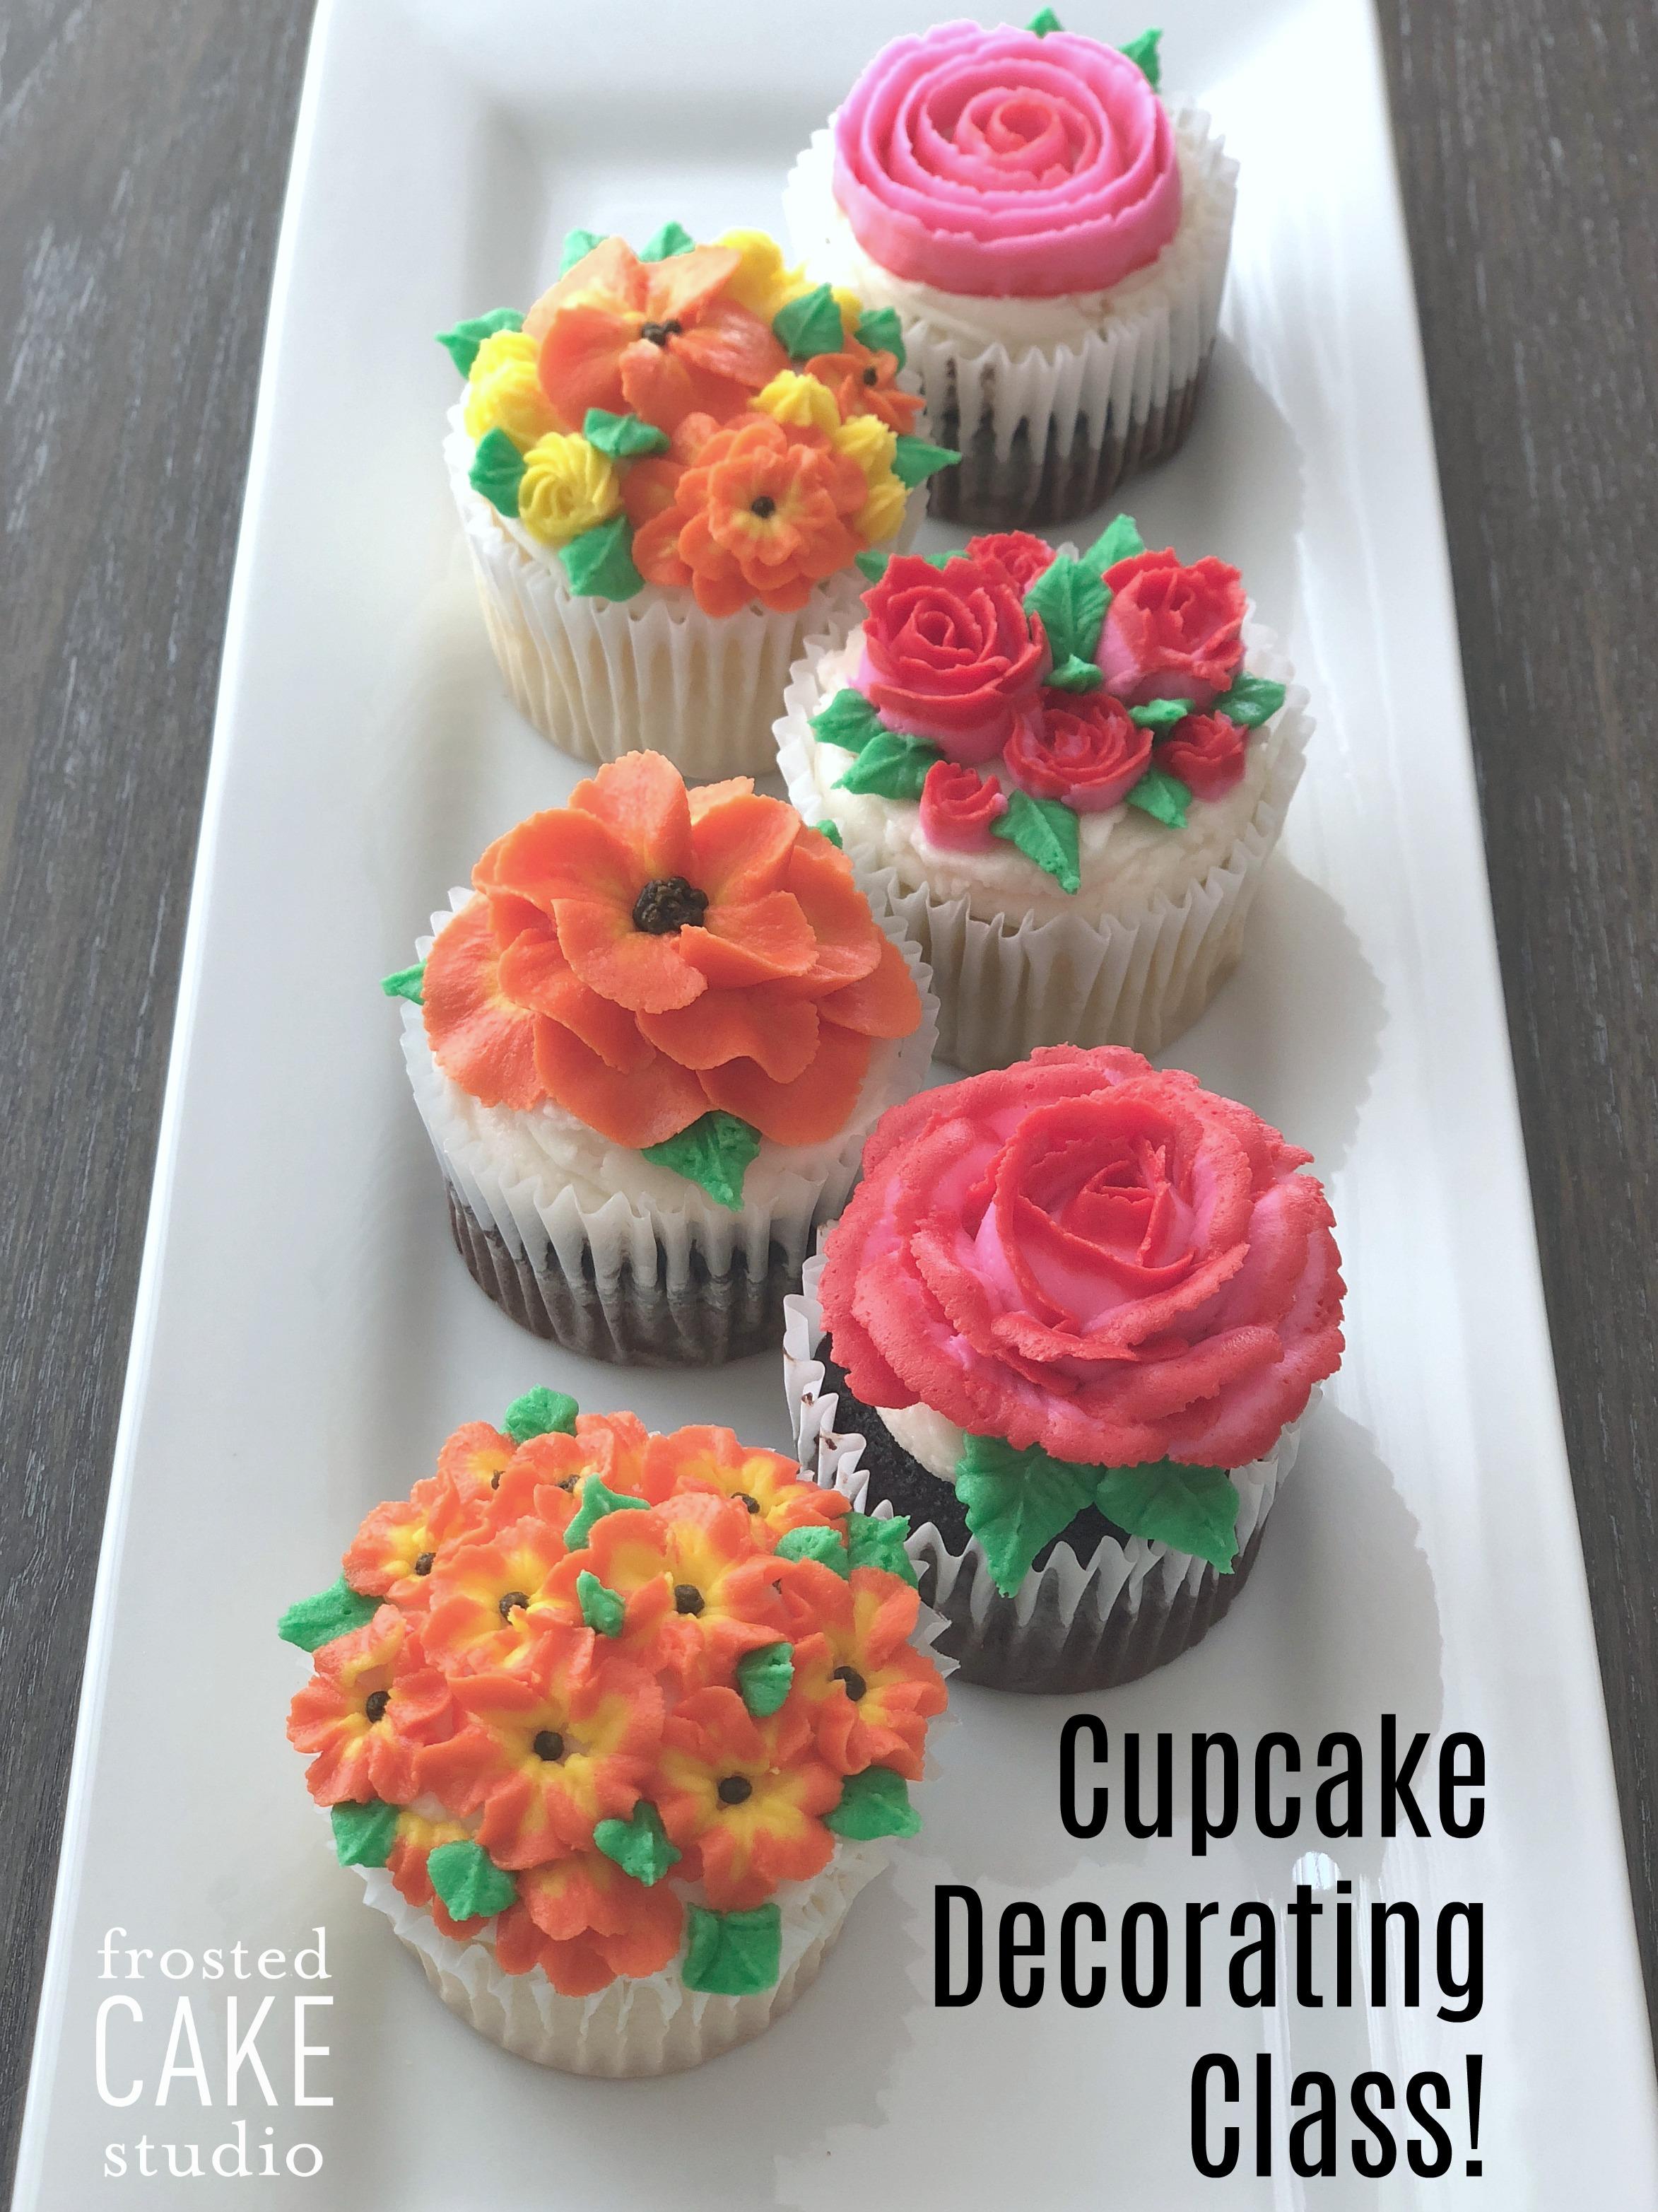 FCS Buttercream Piped Flowers Cupcake Decorating Class.jpg